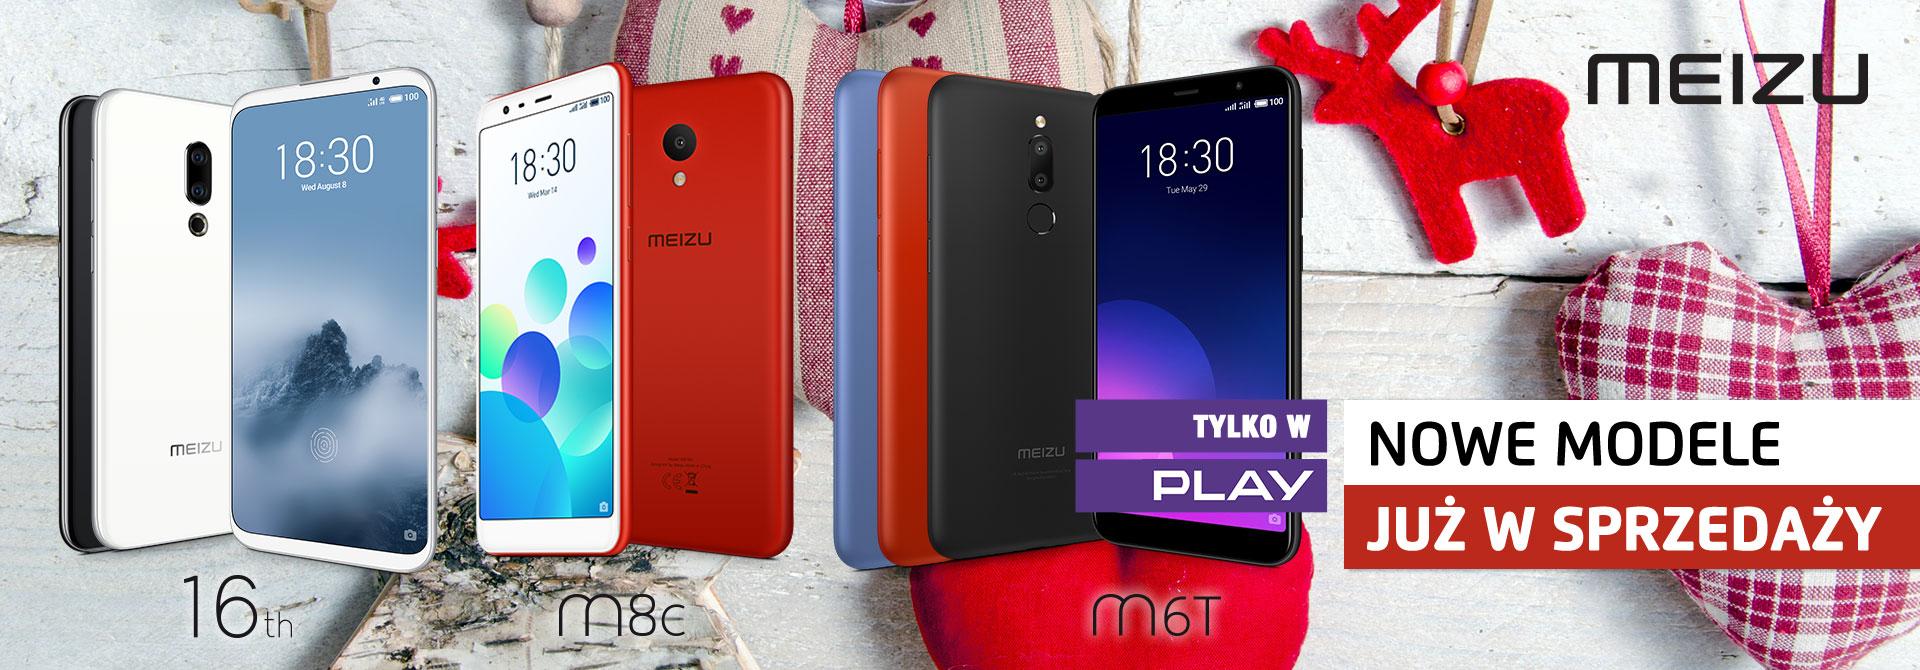 Nowe telefony Meizu - 16th, M6T, M8c